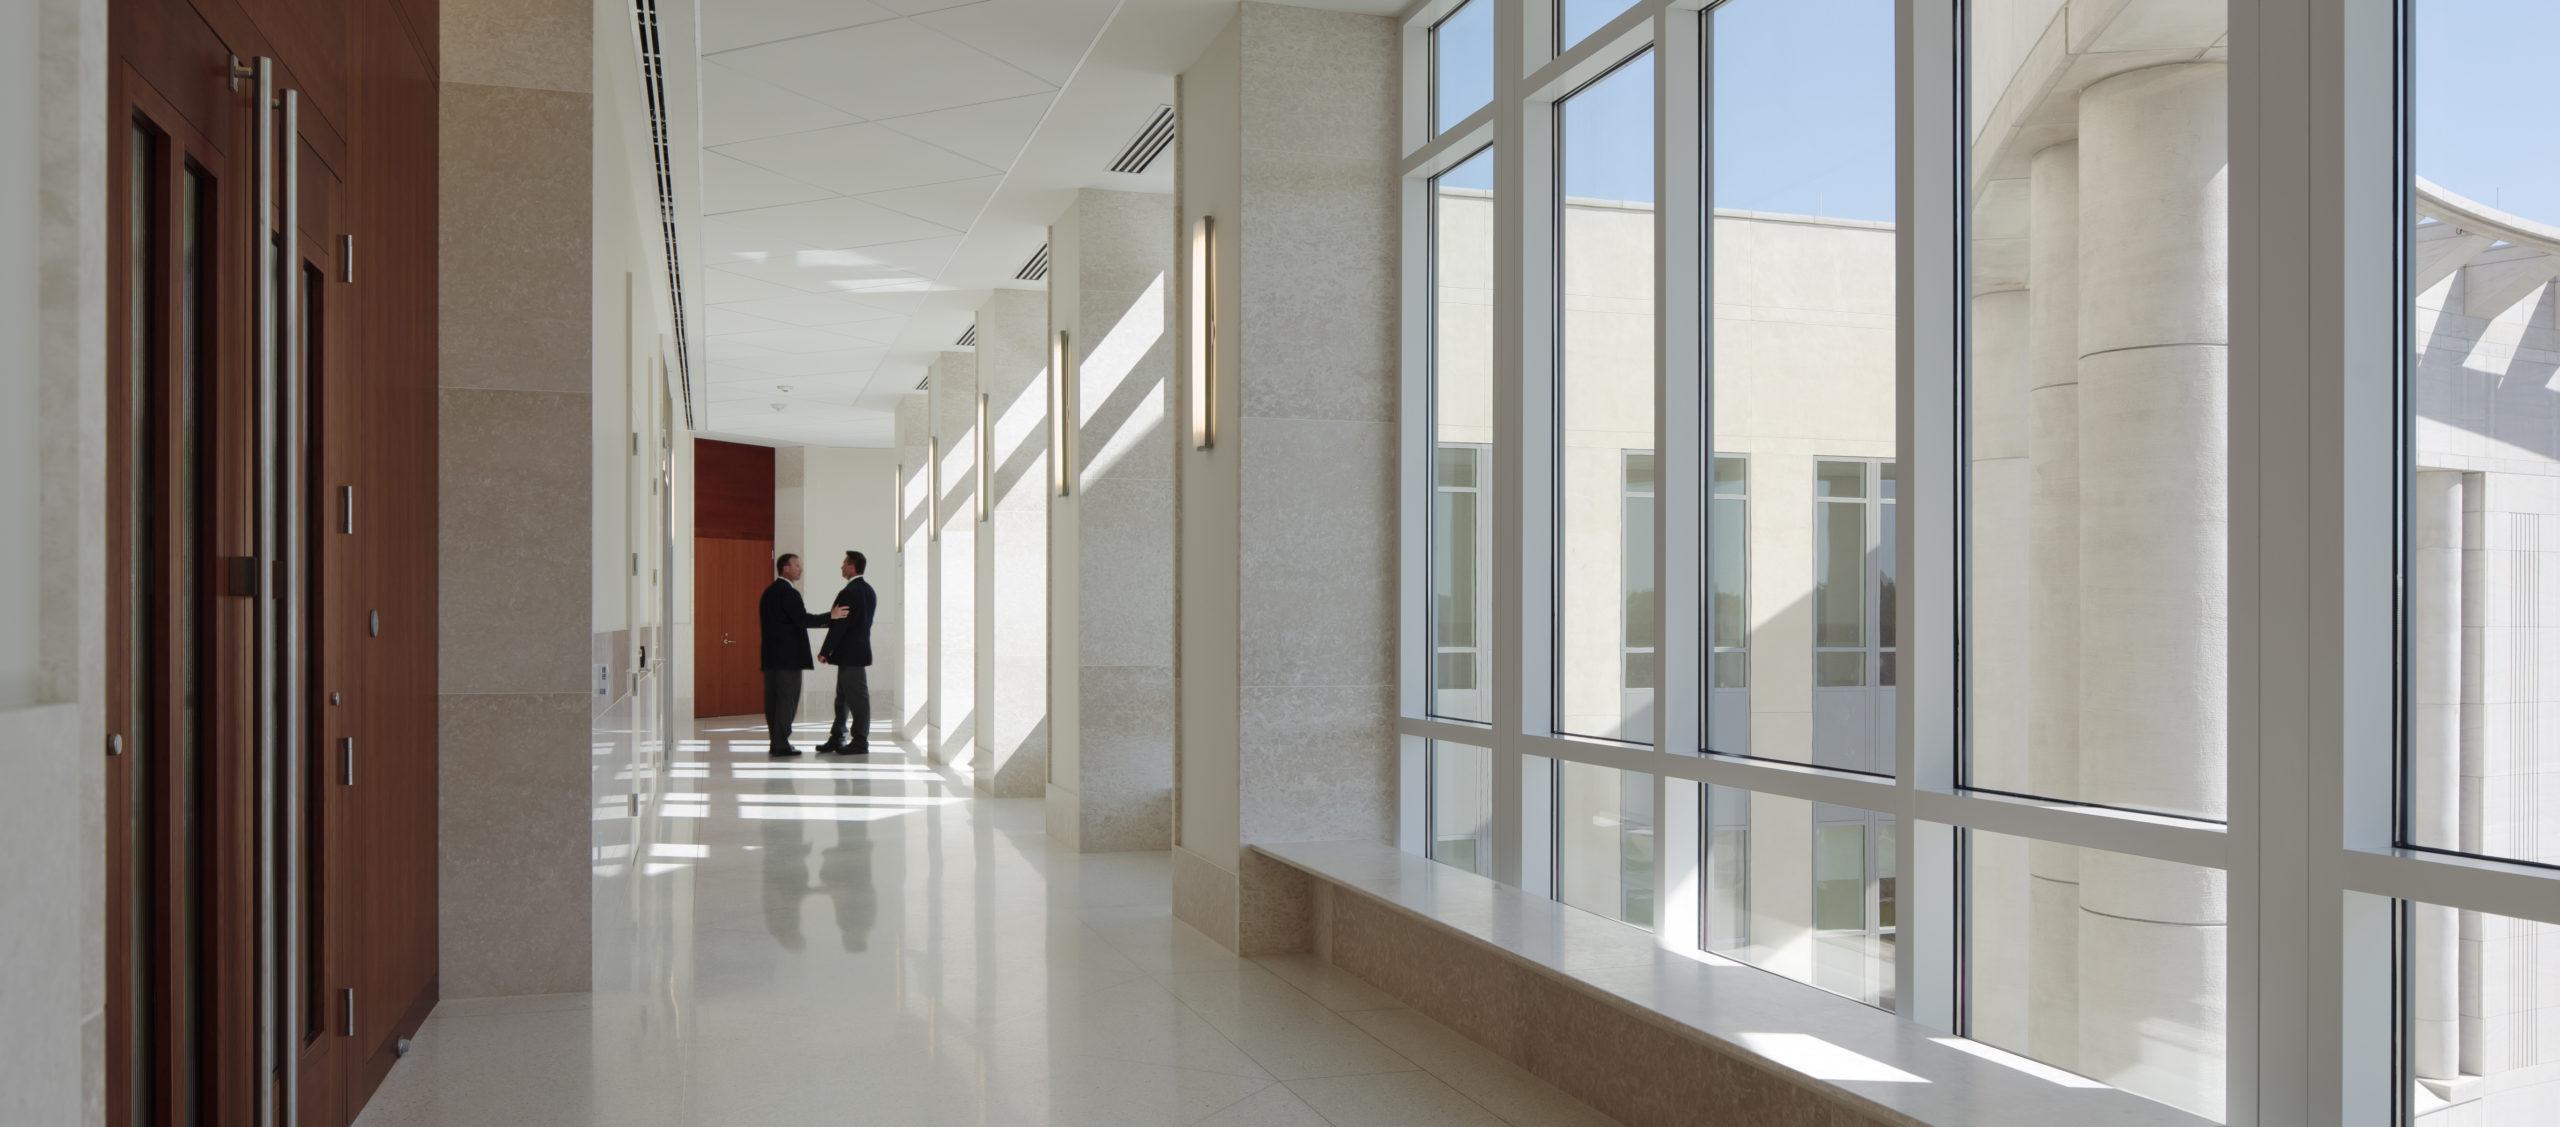 Bond Courthouse